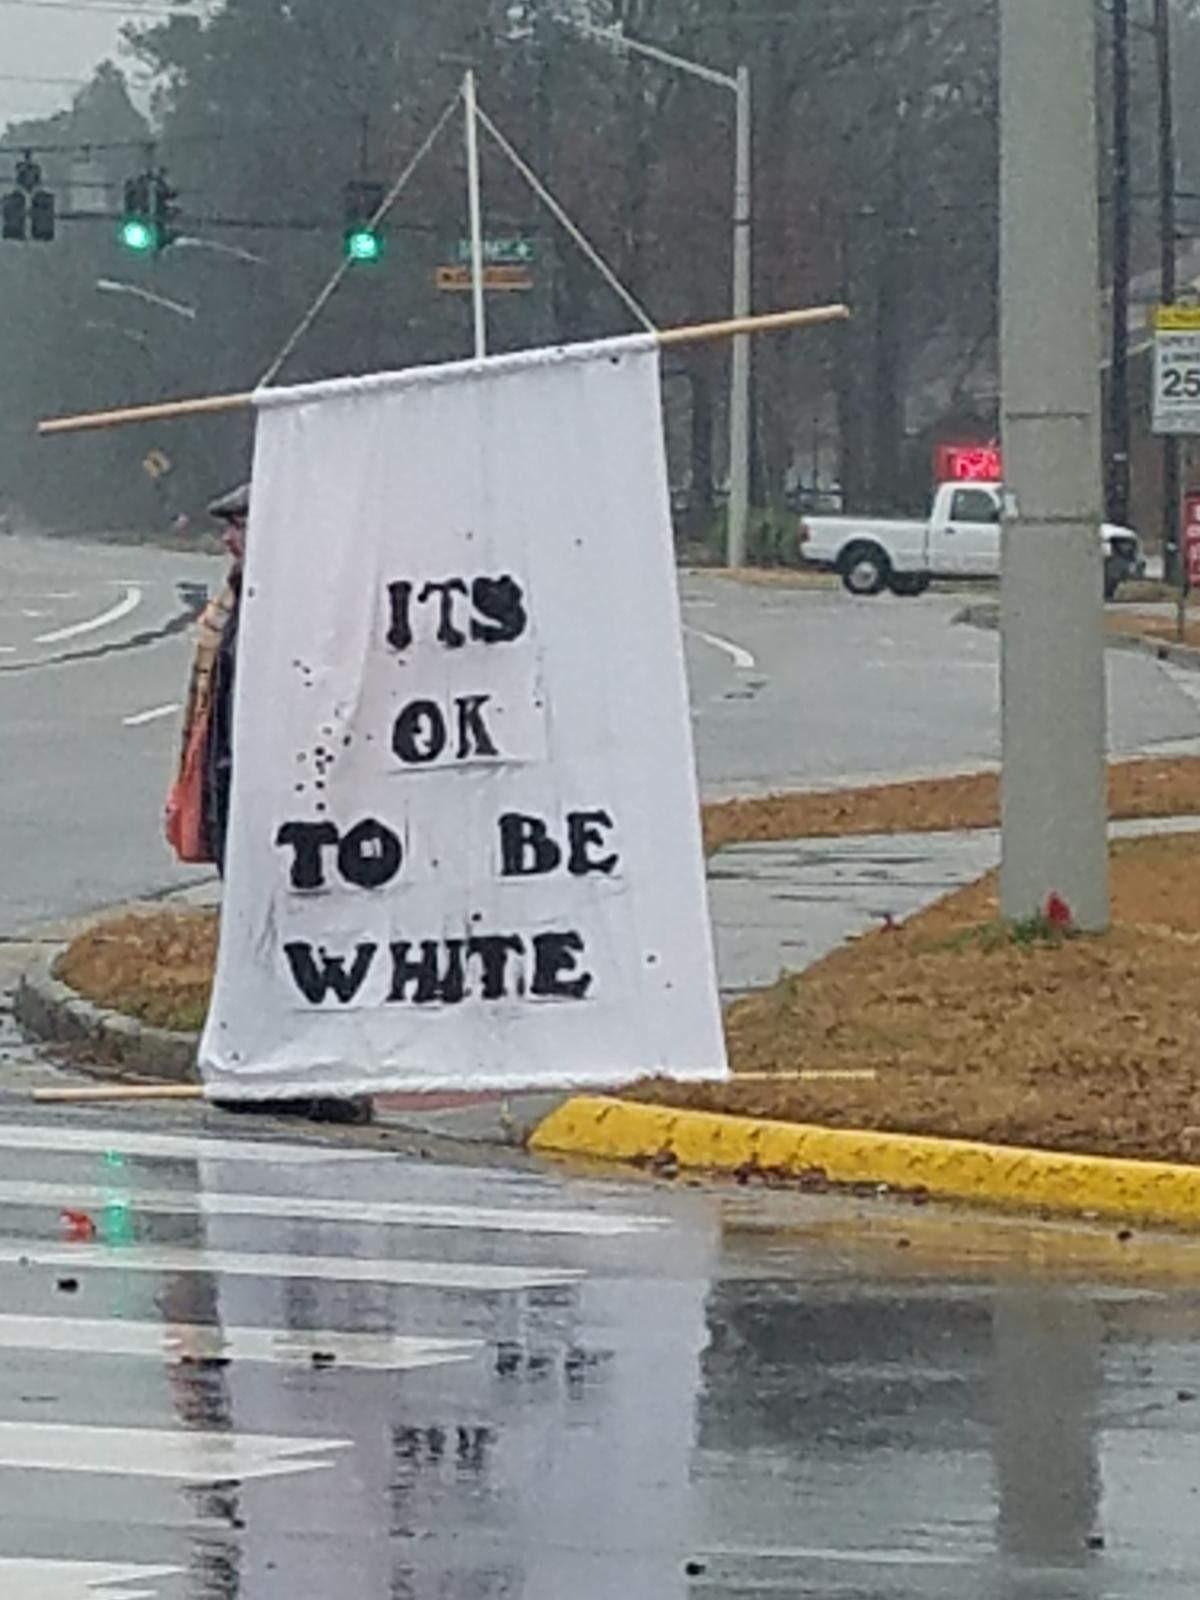 its ok to be white sign toni klemmer photo_1549906254968.jpg.jpg